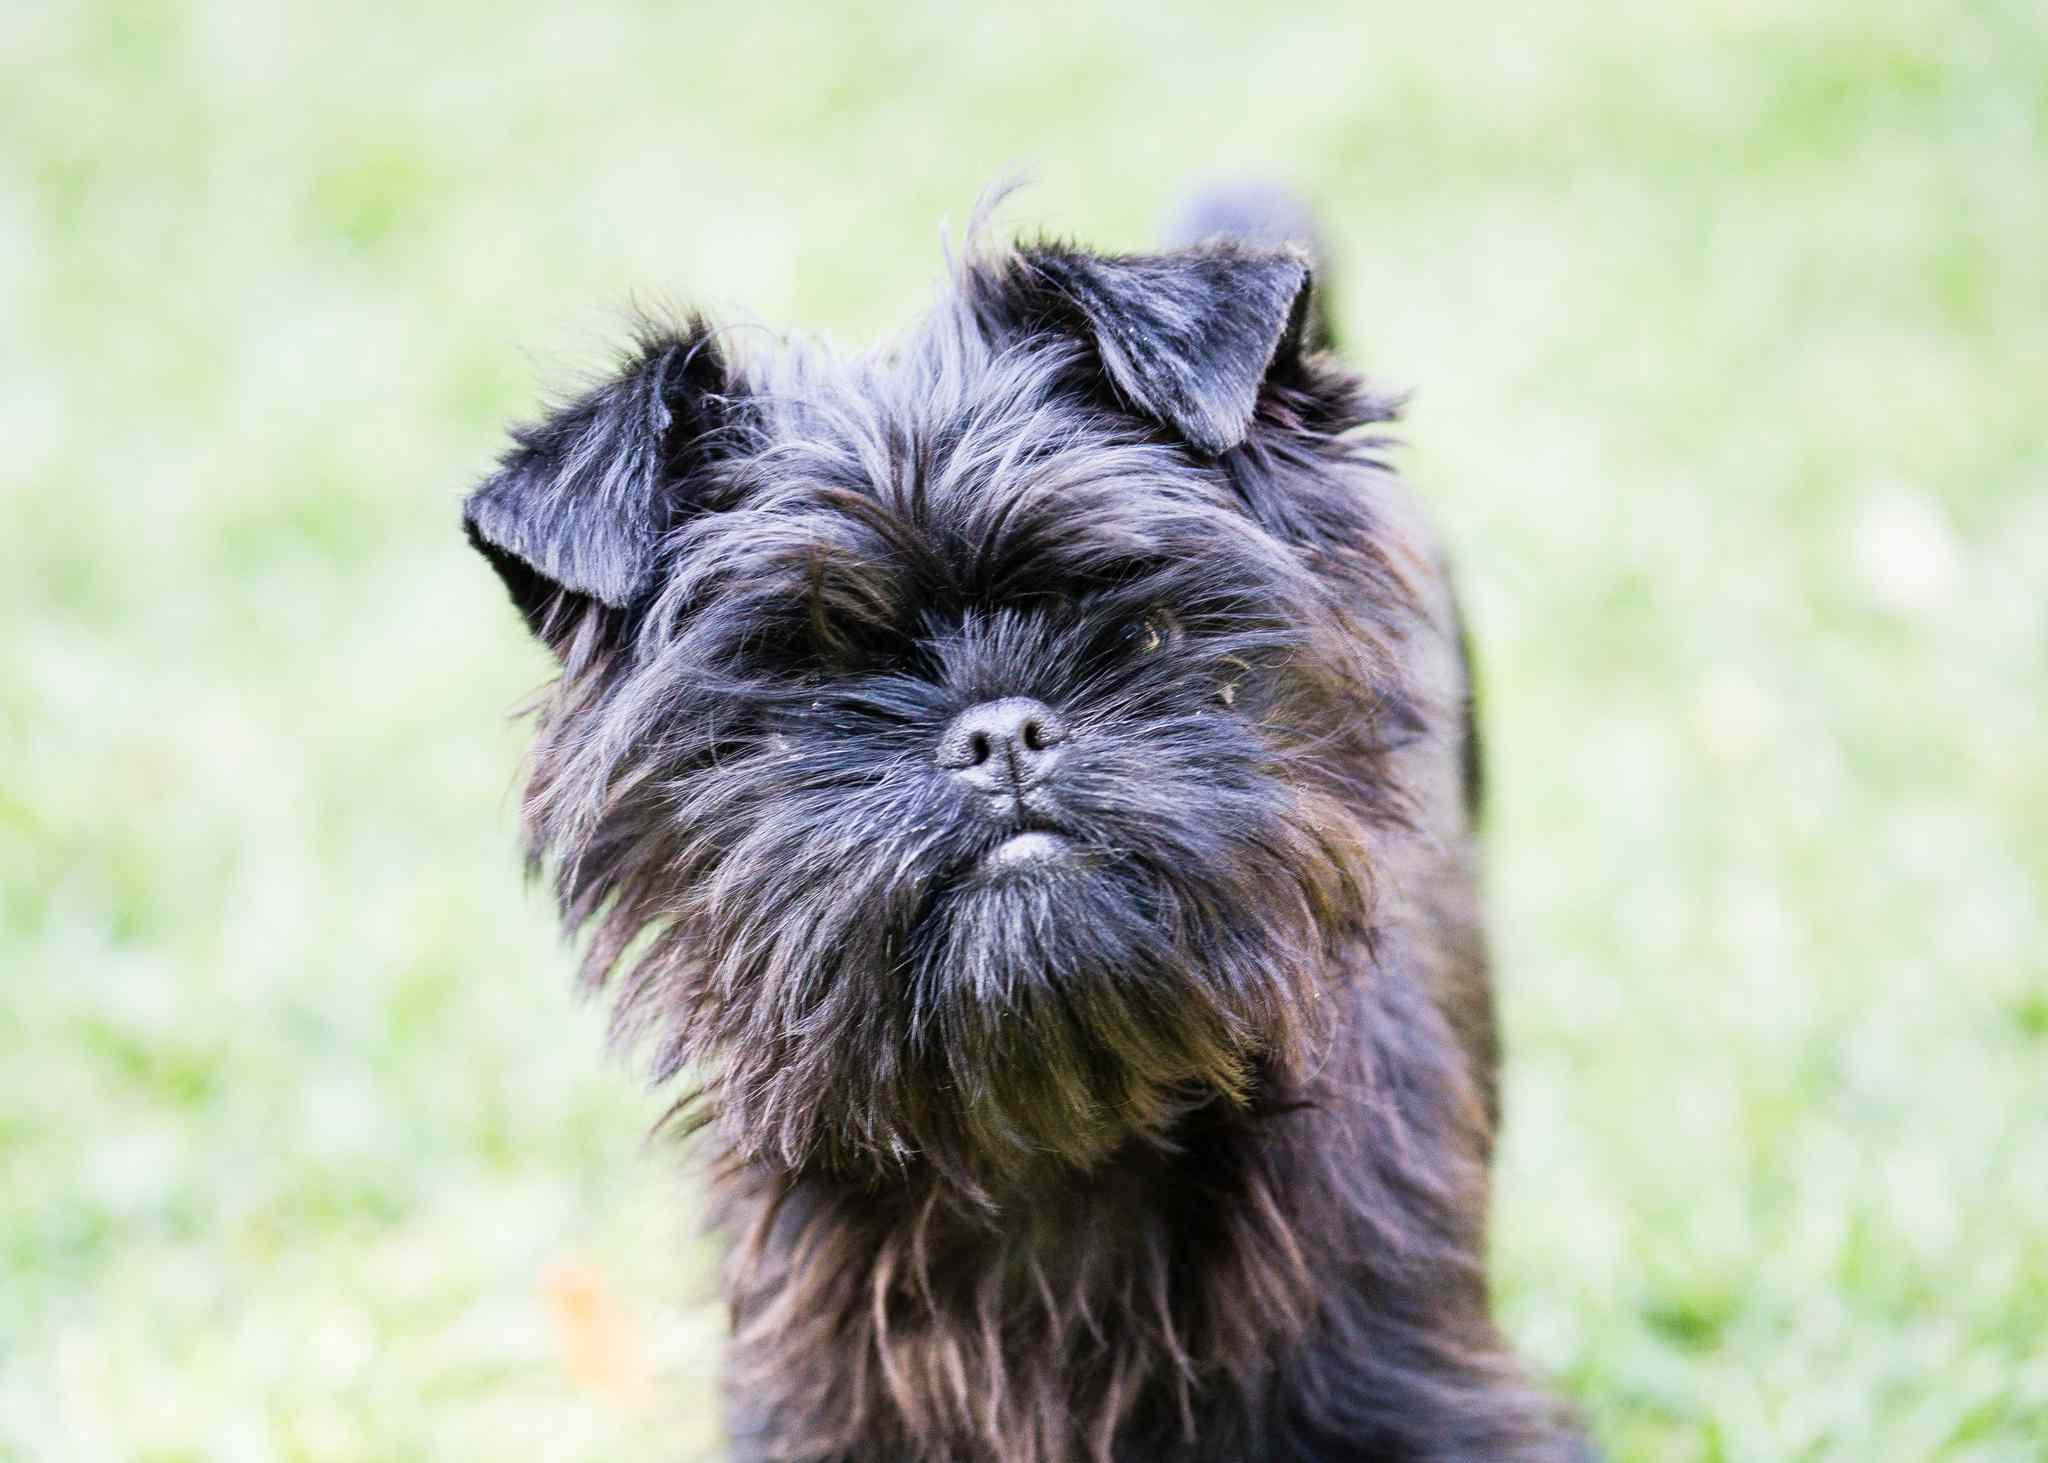 Portrait of Affenpinscher dog in grass.